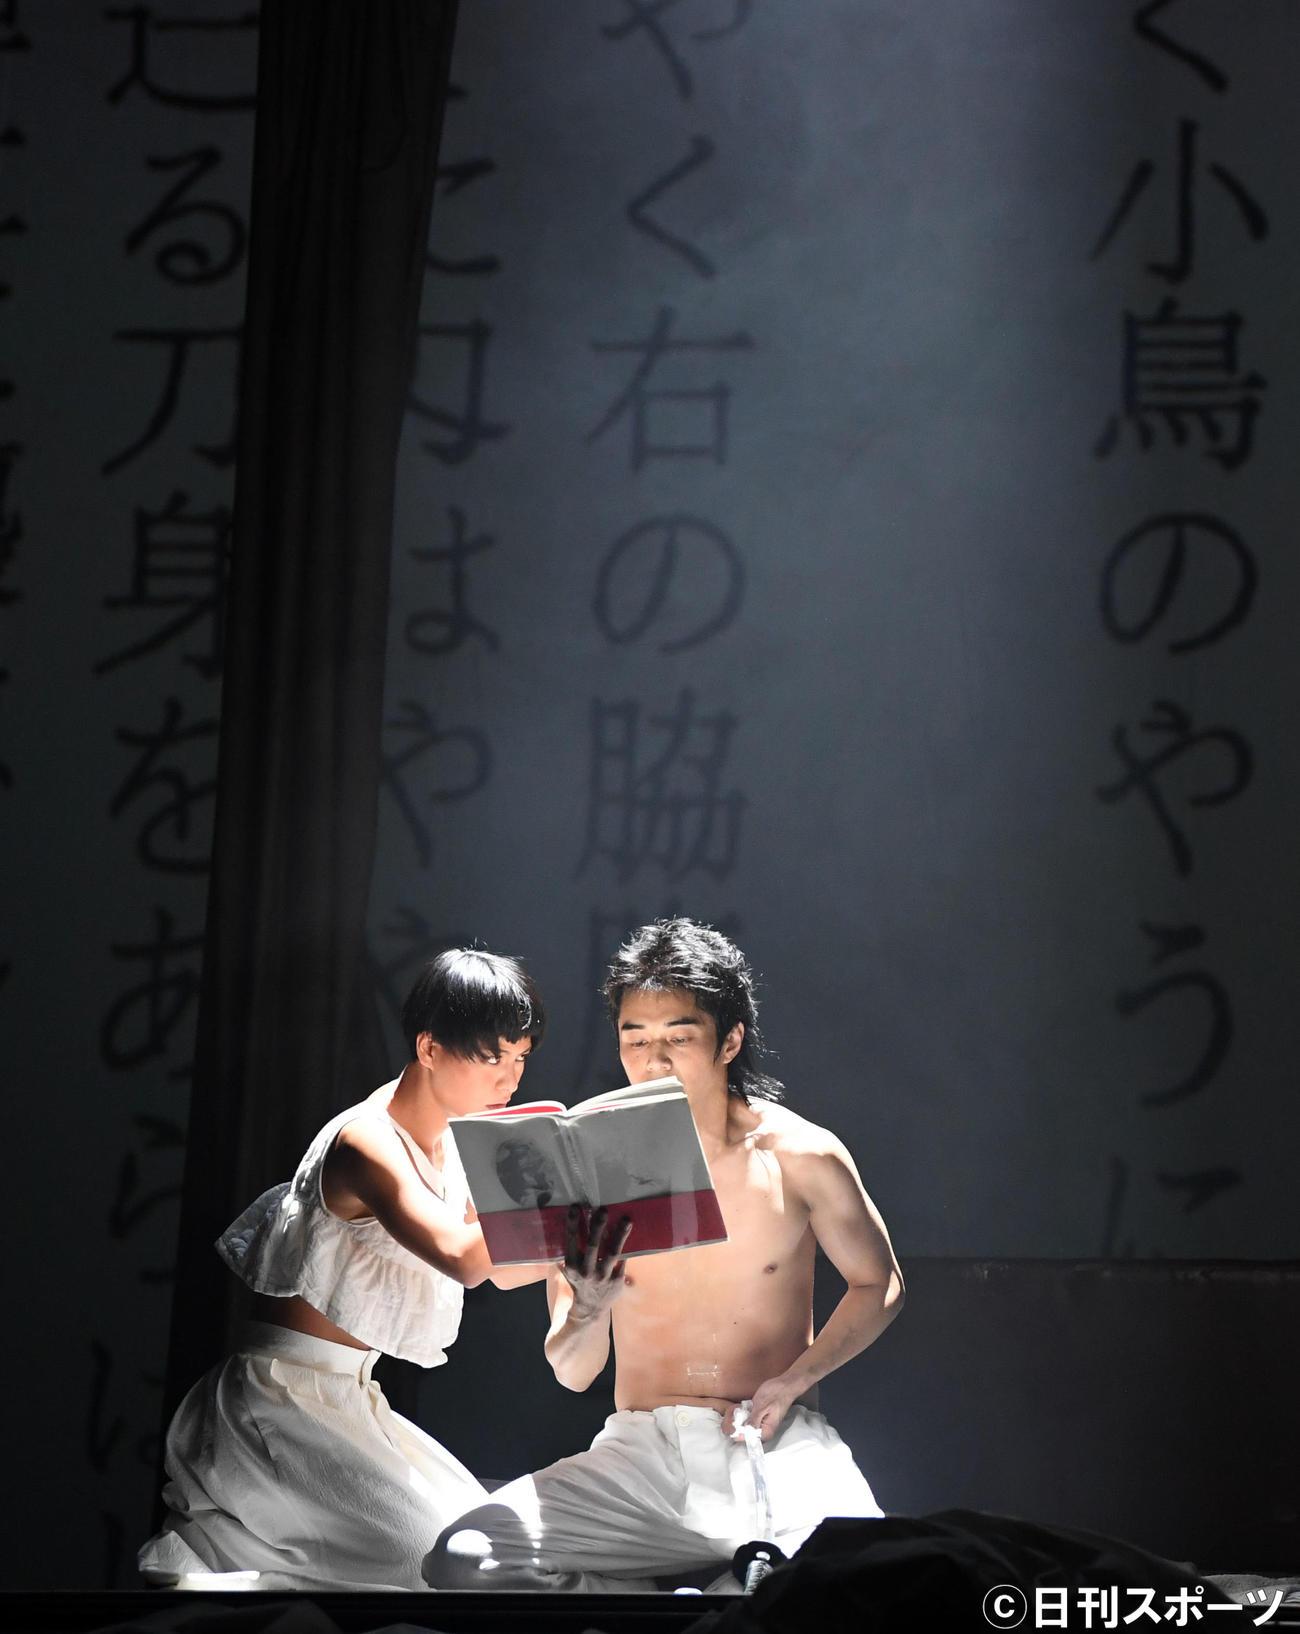 「MISHIMA2020」公開舞台稽古で熱演する東出昌大(右)と菅原小春(撮影・横山健太)